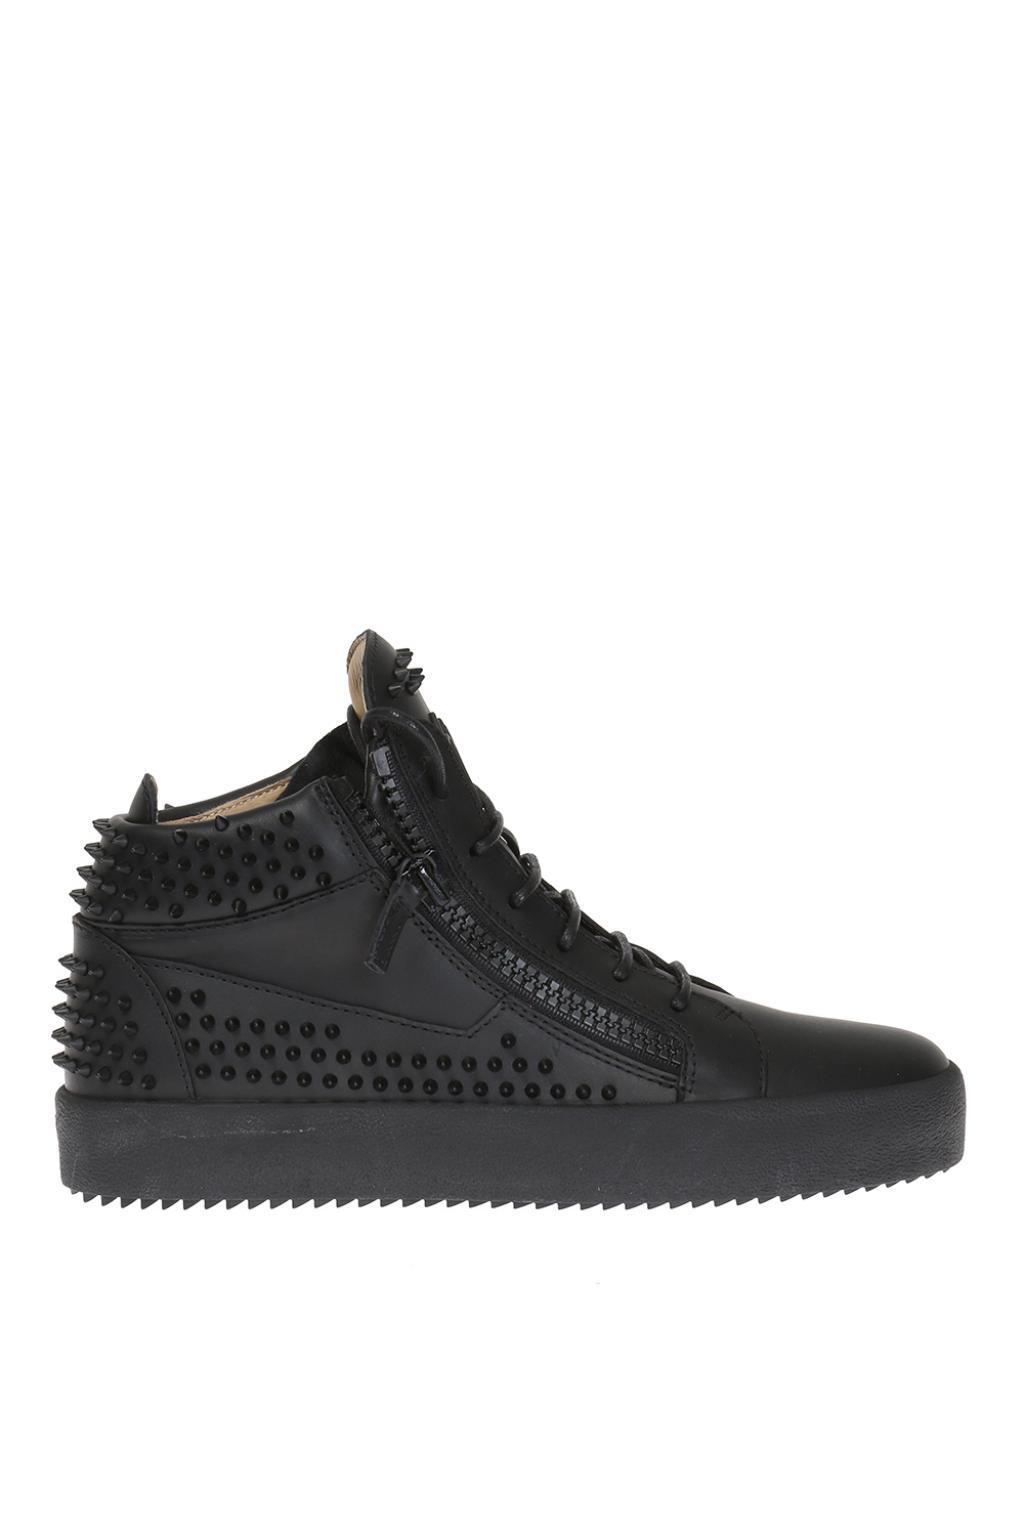 Giuseppe ZanottiStudded May London High-Top Sneakers MfFixMiAP